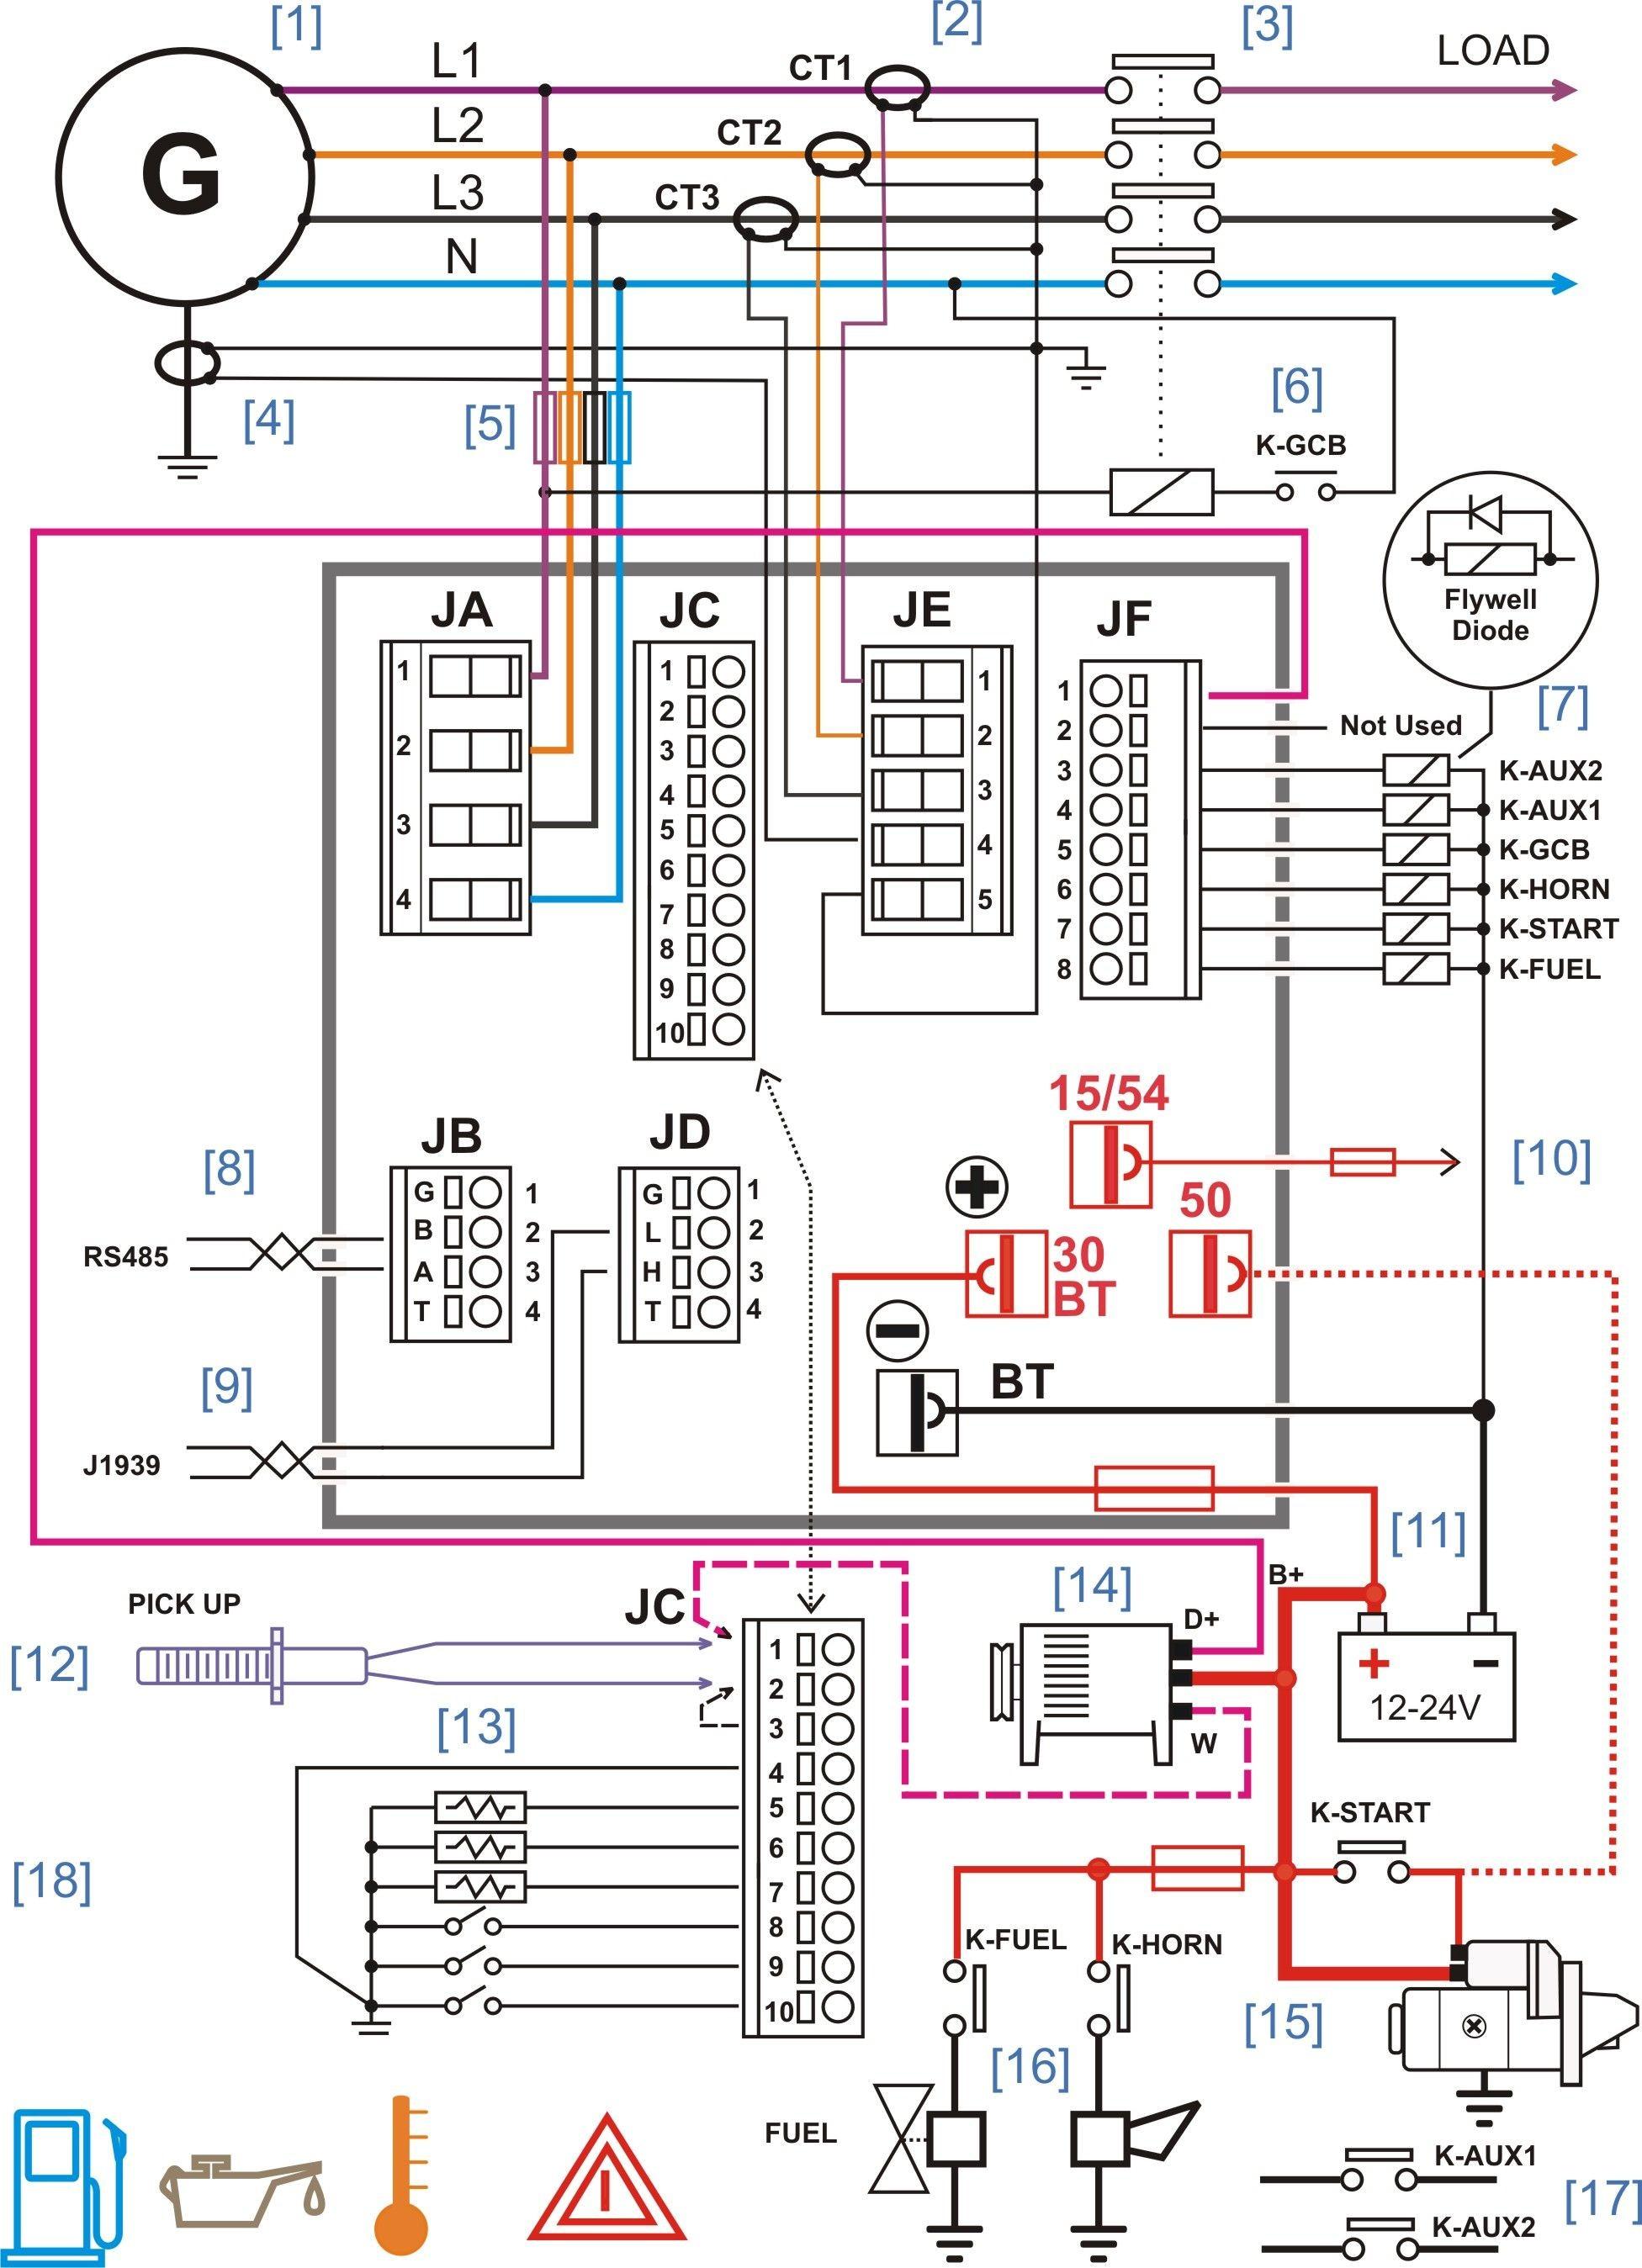 5 4 Triton Engine Diagram Cam Phaser Noise Repair Kit Ford 3 Valve 6 Diesel Generator Control Panel Wiring Of